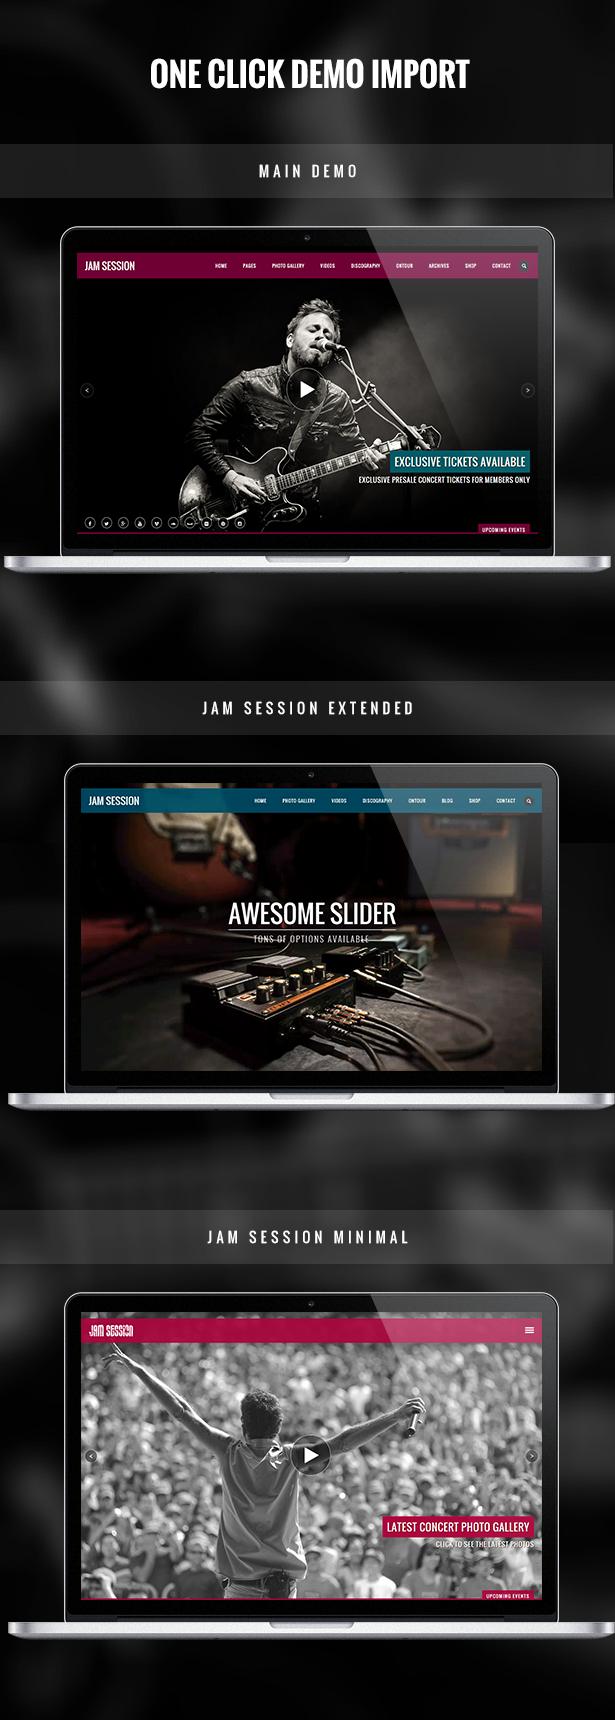 موضوع Music WordPress - JamSession - استيراد تجريبي بنقرة واحدة